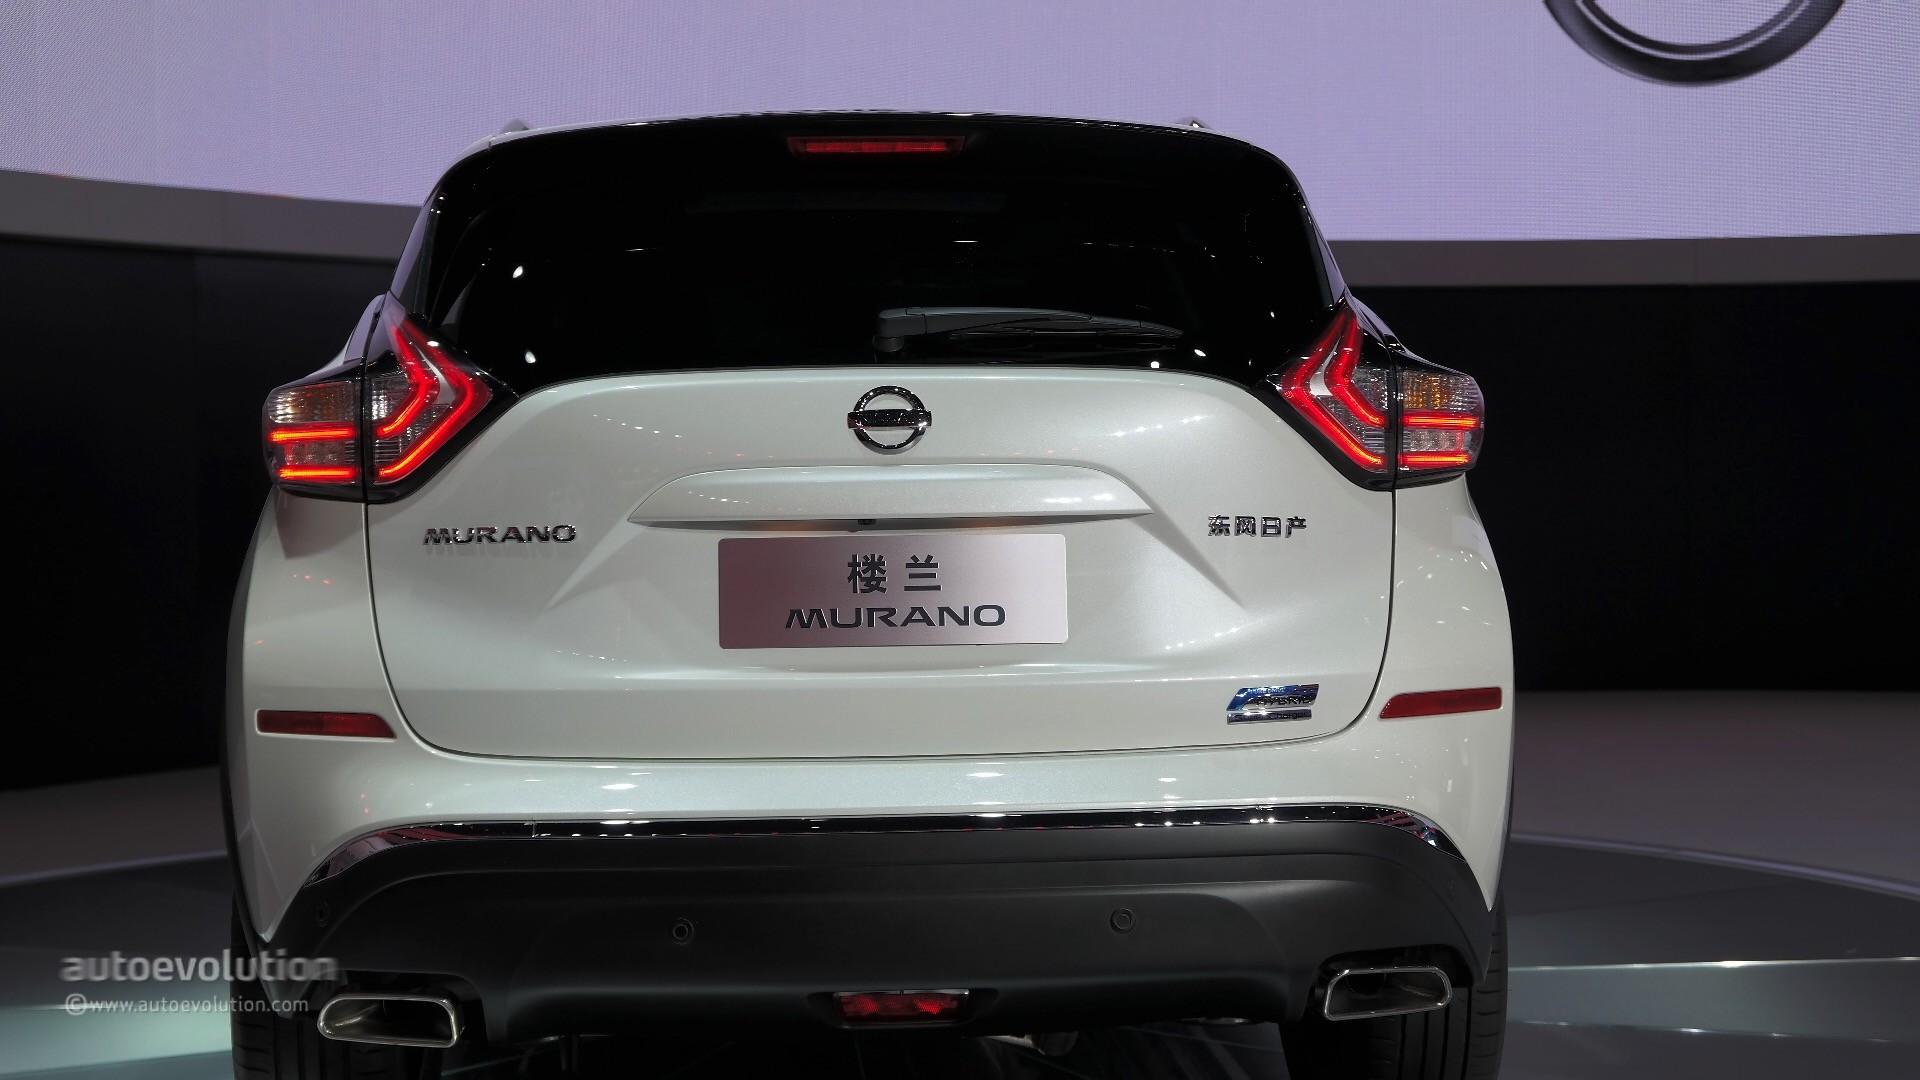 World Premiere for 2016 Nissan Murano Hybrid at Auto Shanghai 2015